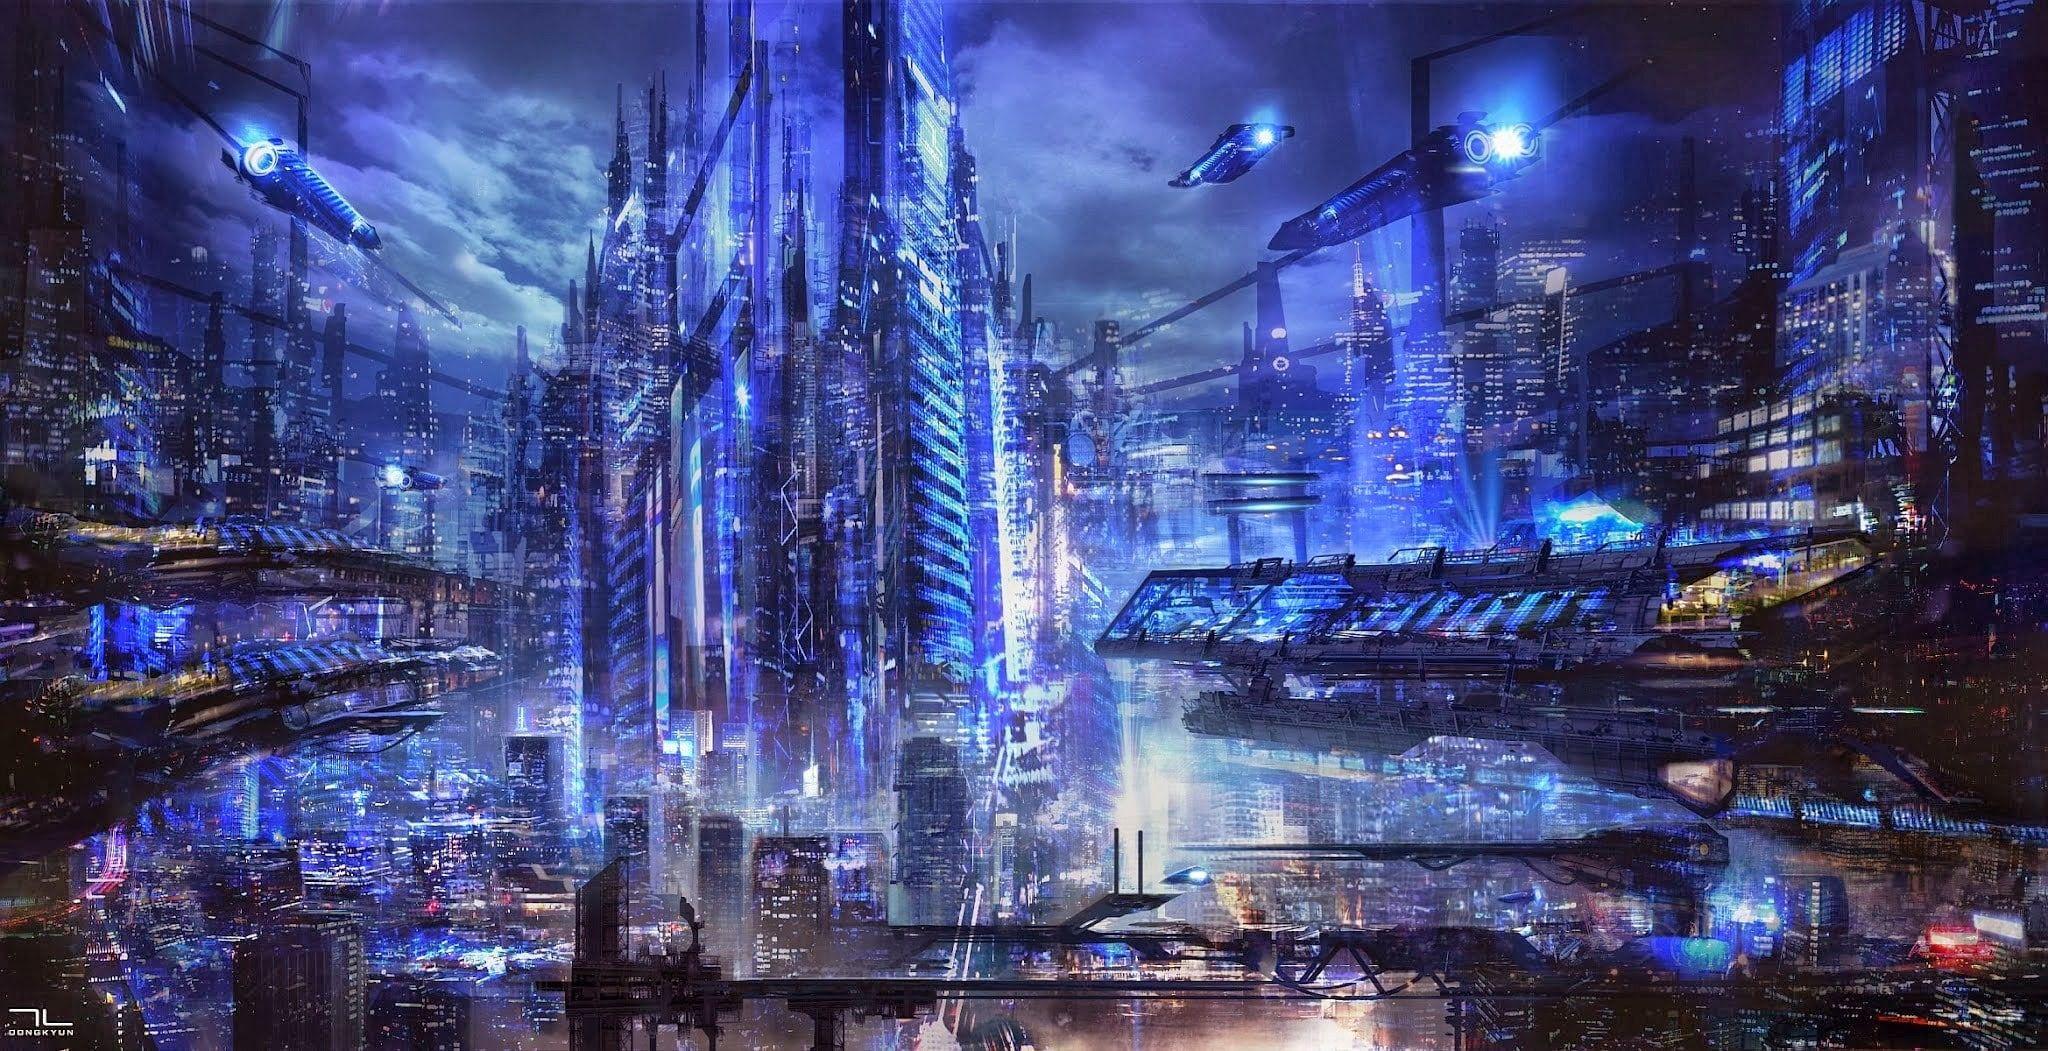 Digital Art Science Fiction Futuristic City 1080p Wallpaper Hdwallpaper Desktop Futuristic City City Wallpaper Future Wallpaper